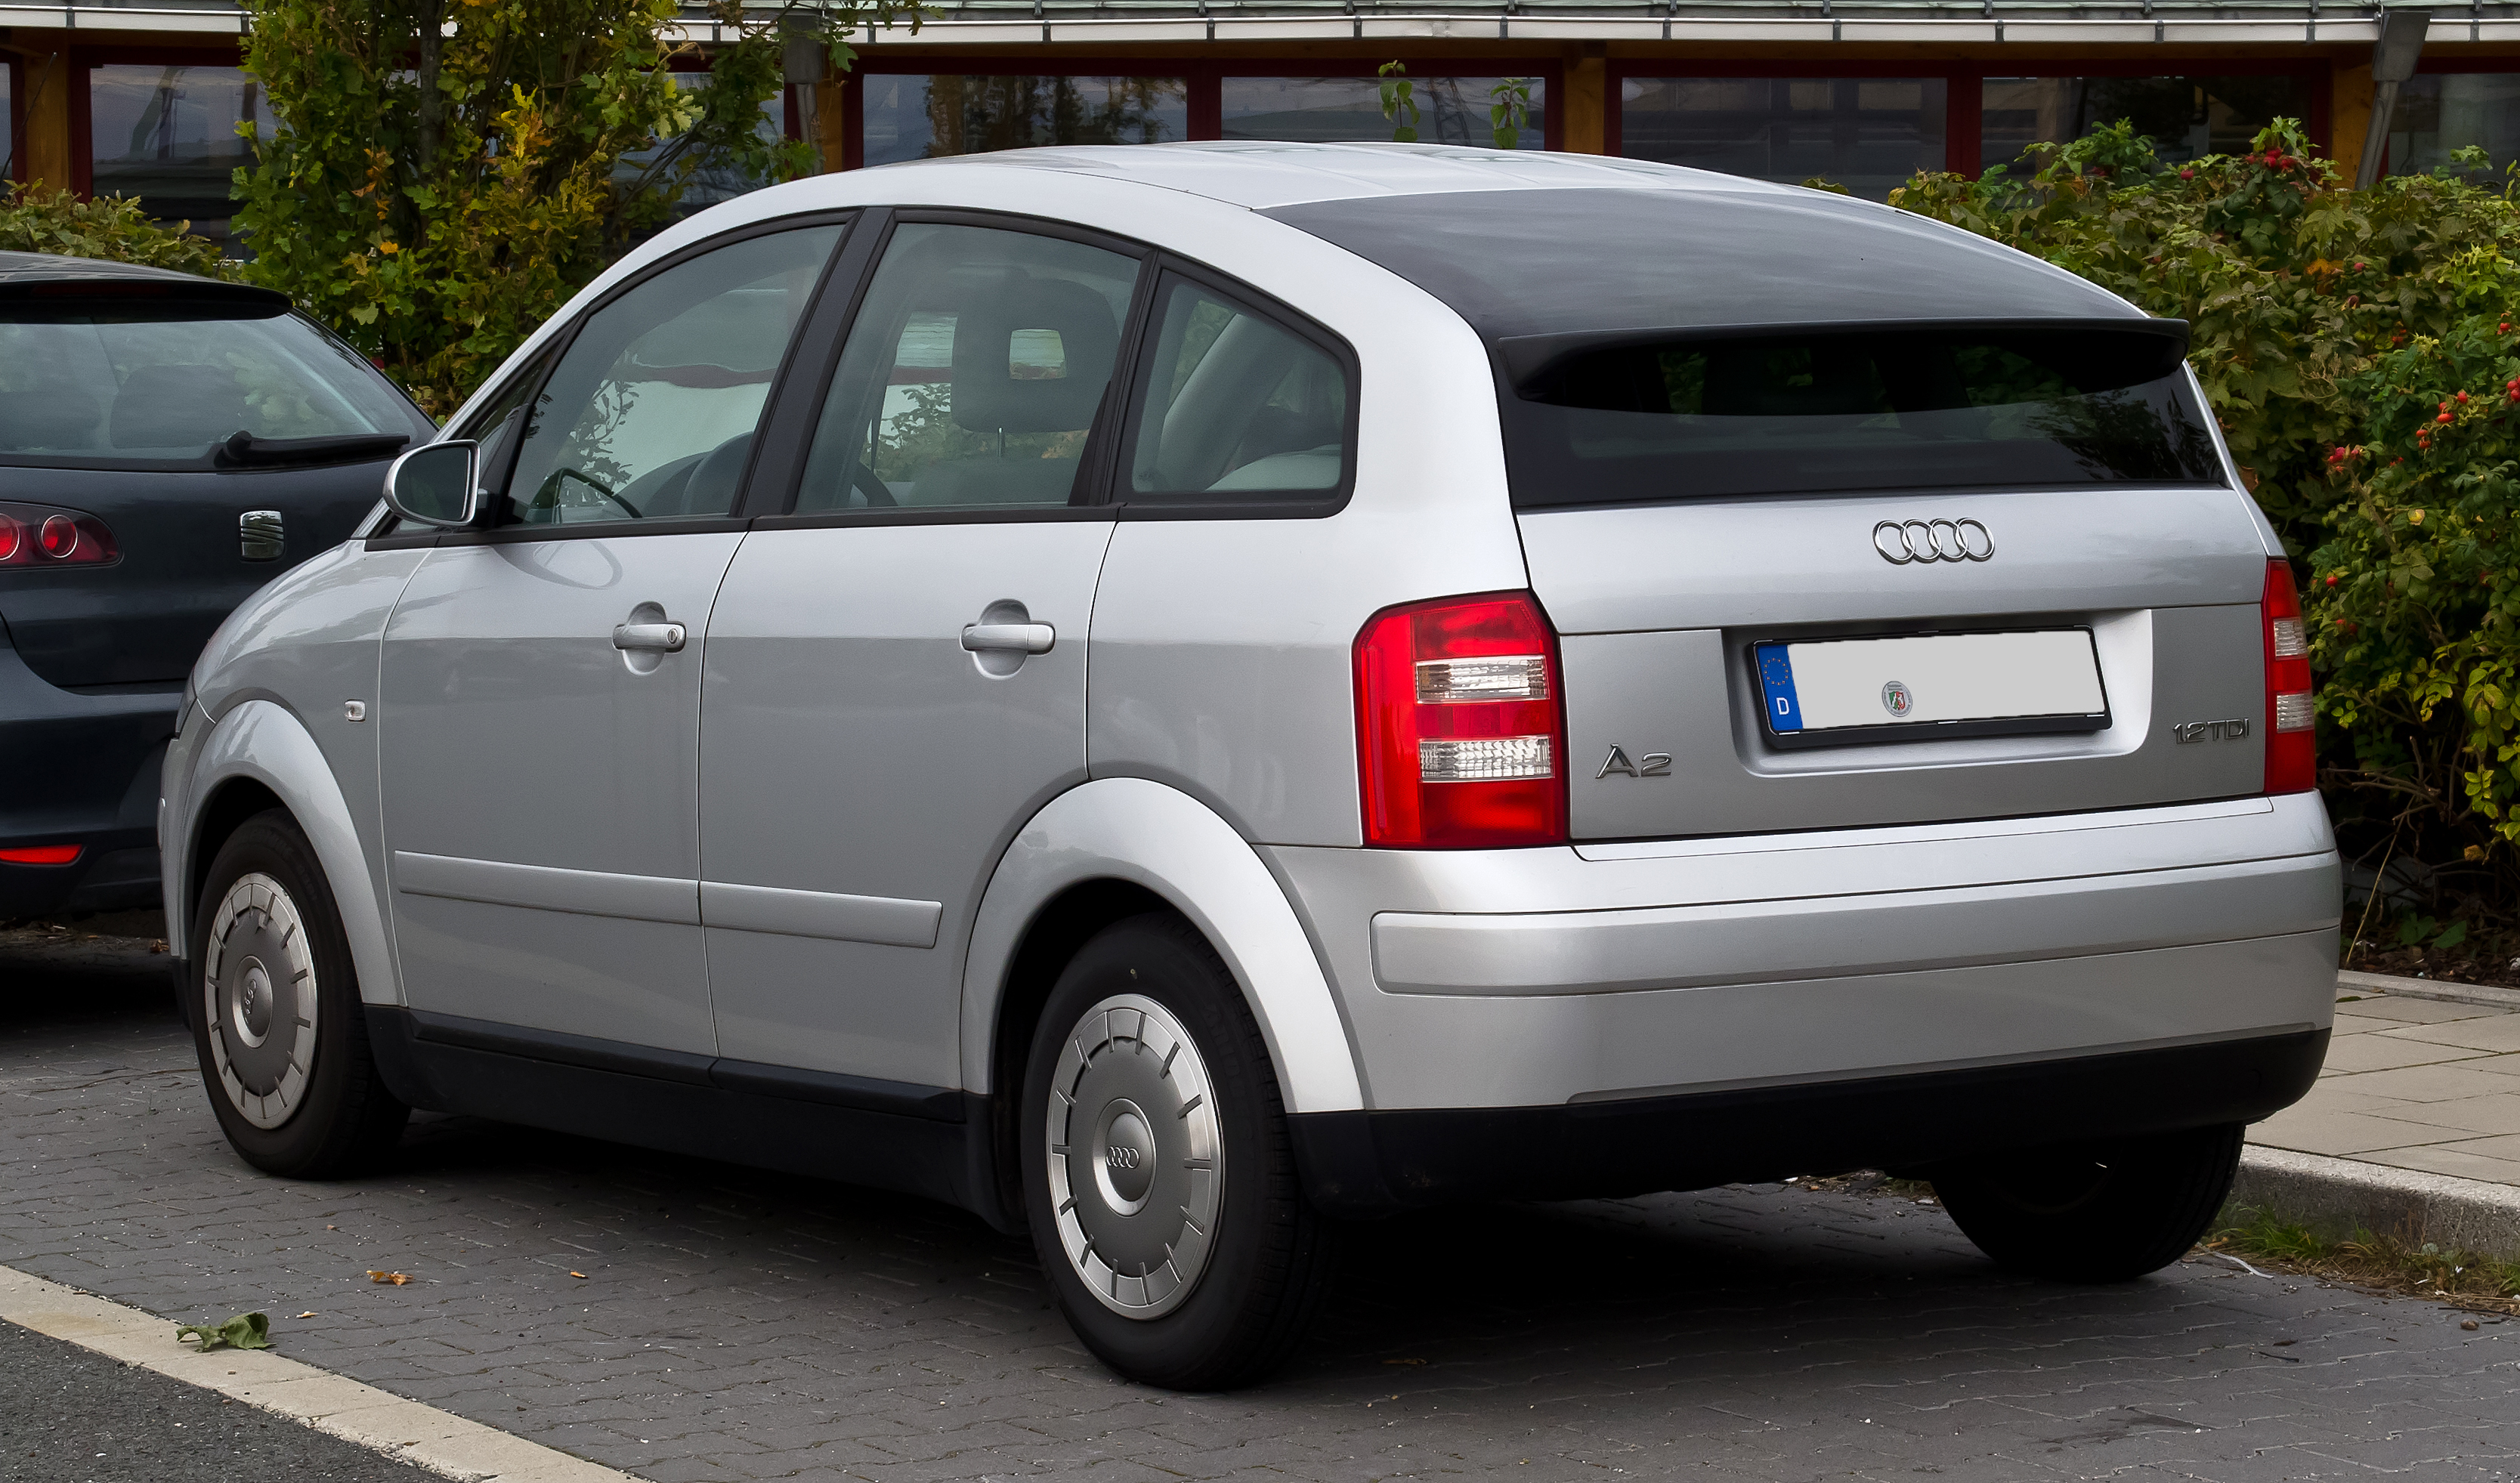 Archivo Audi A2 1 2 Tdi Heckansicht 23 September 2012